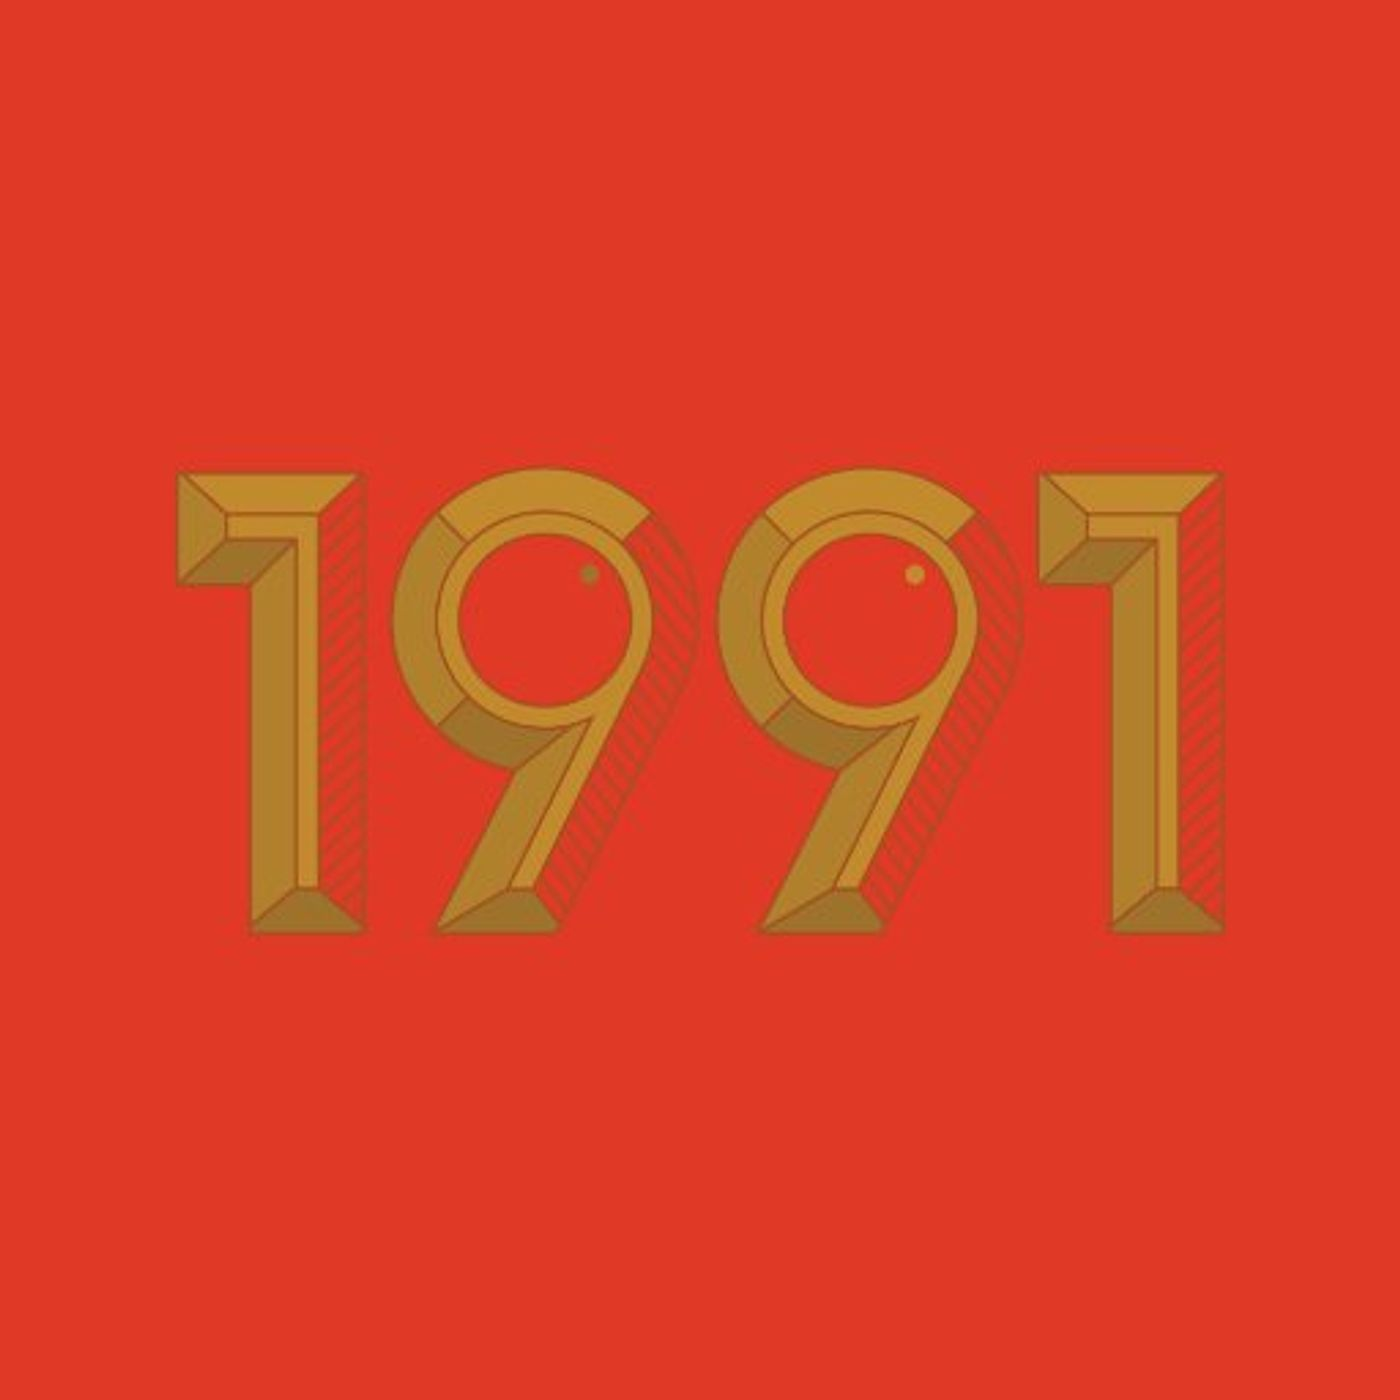 Reelin' August 18th, 1991